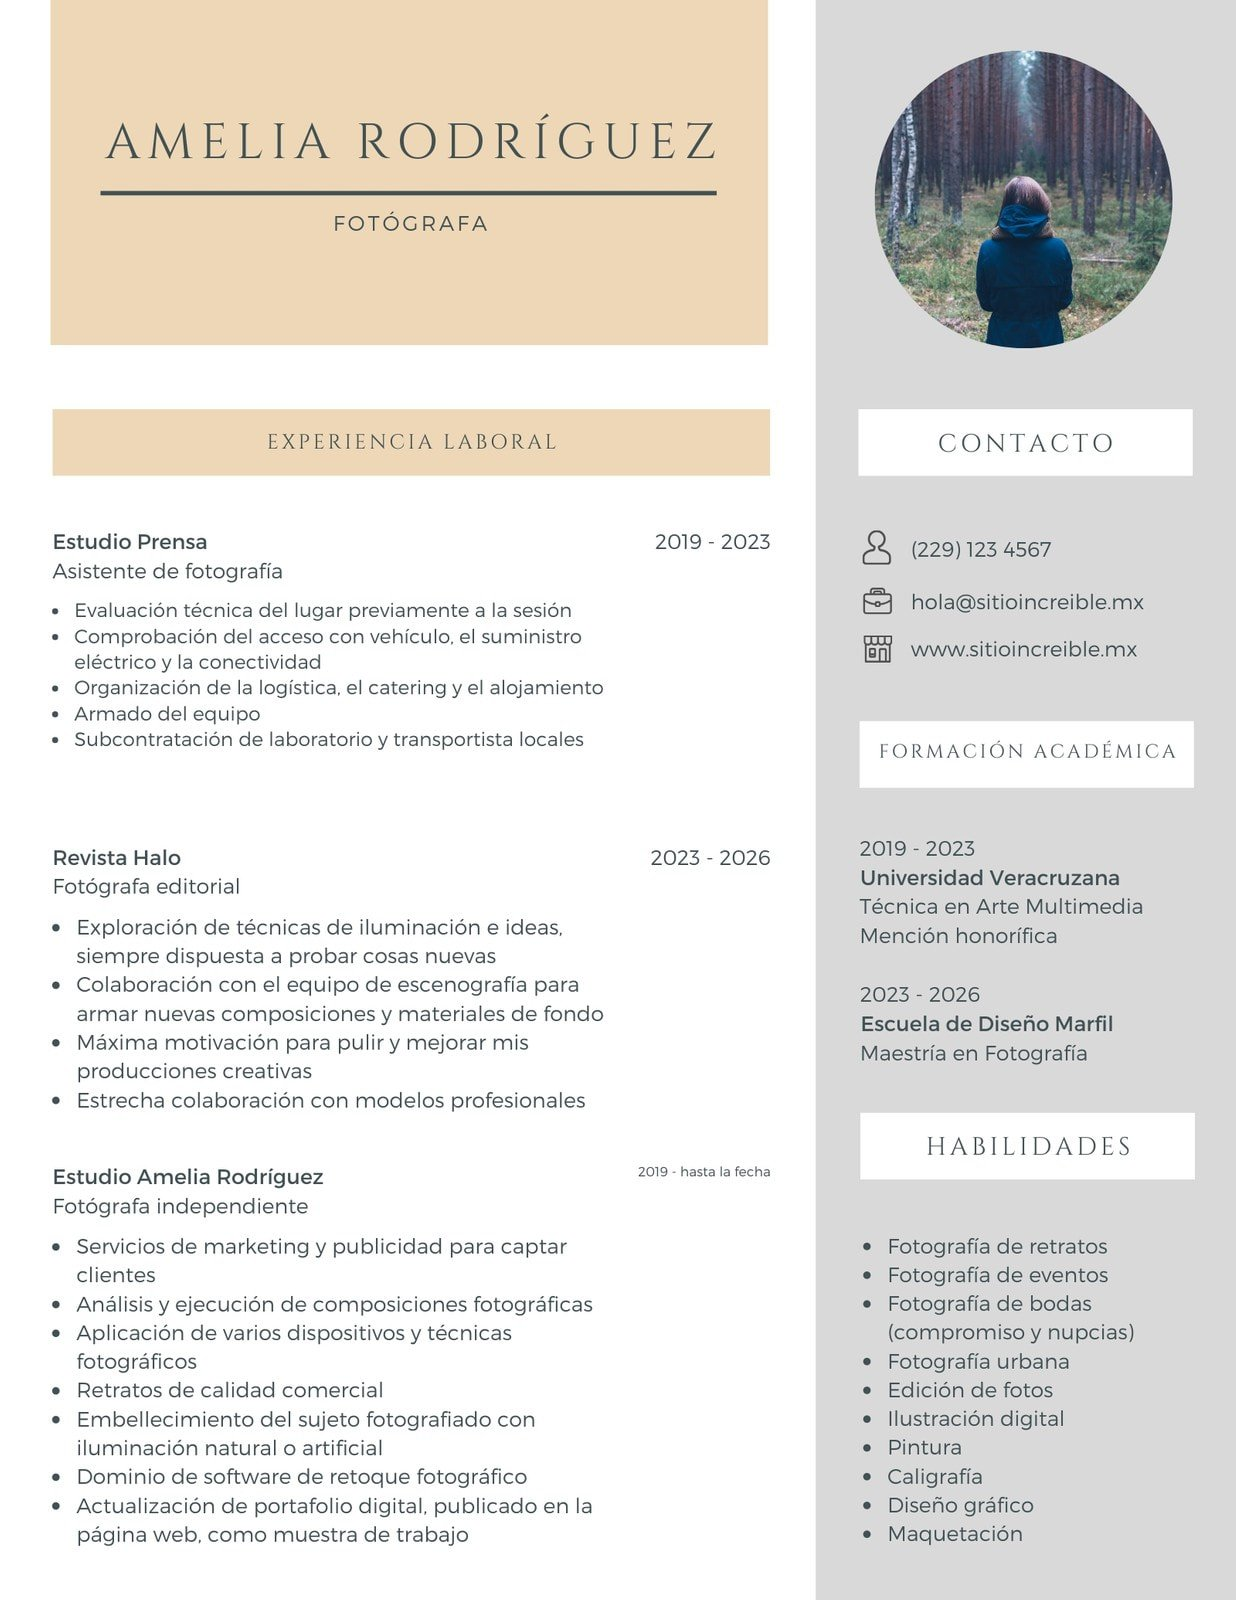 Beige y Blanco Fotógrafa Corporativo Currículum